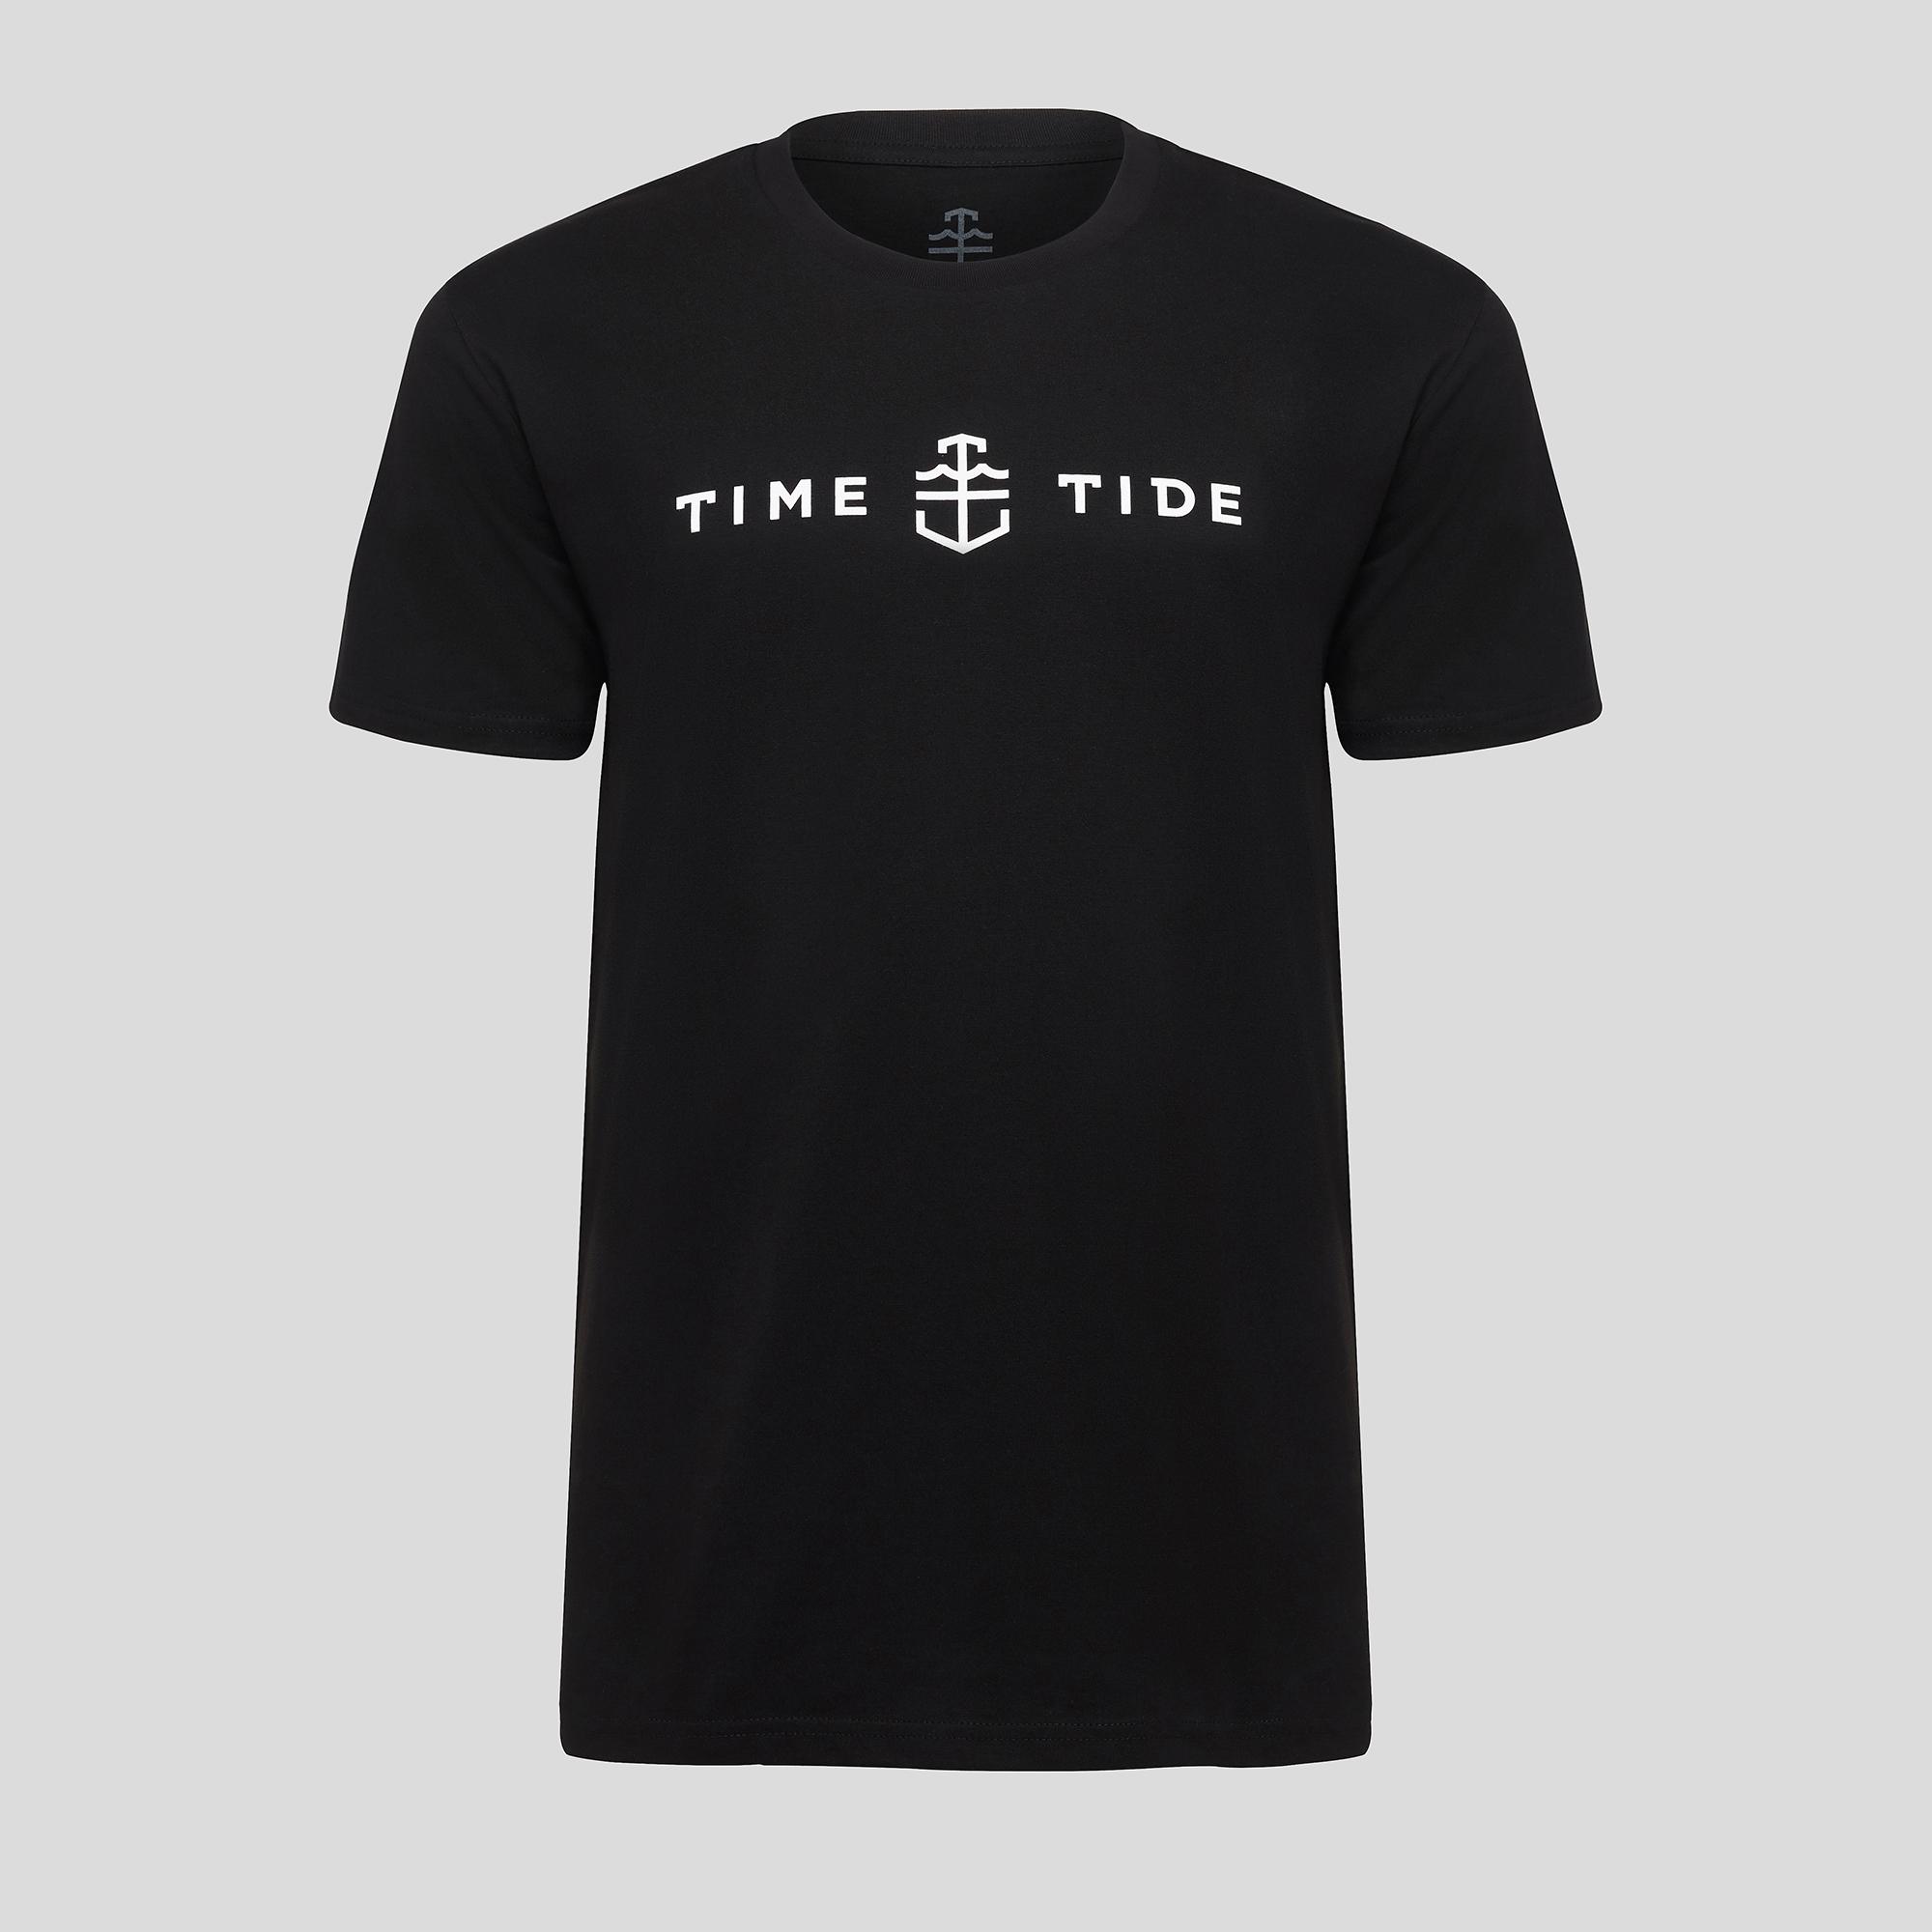 Men's black print t-shirt